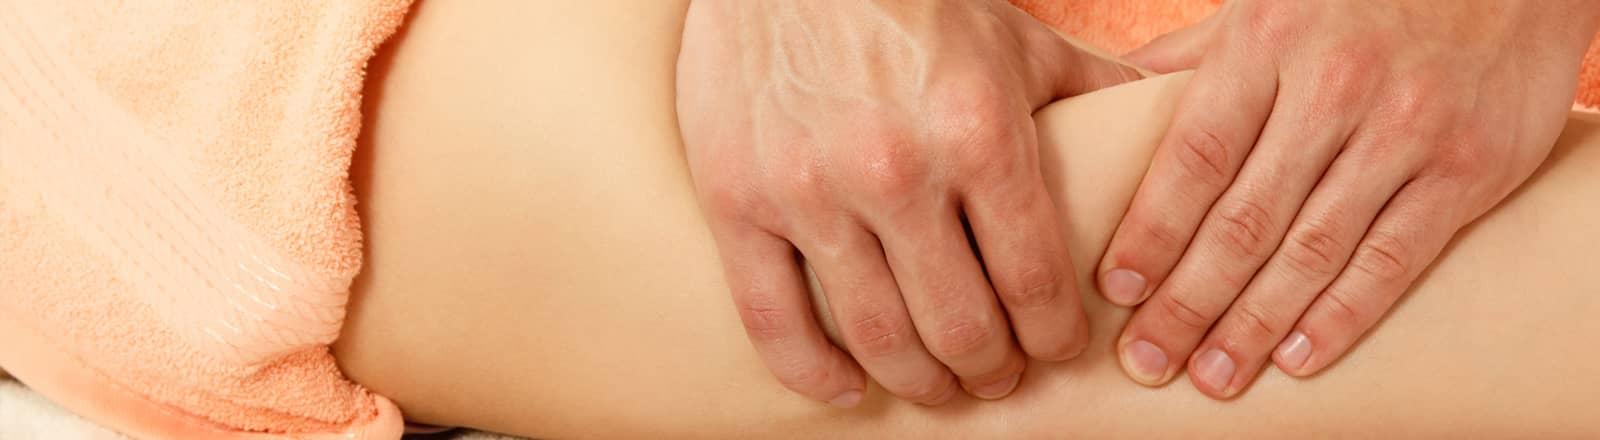 masaje descontracturante bilbao